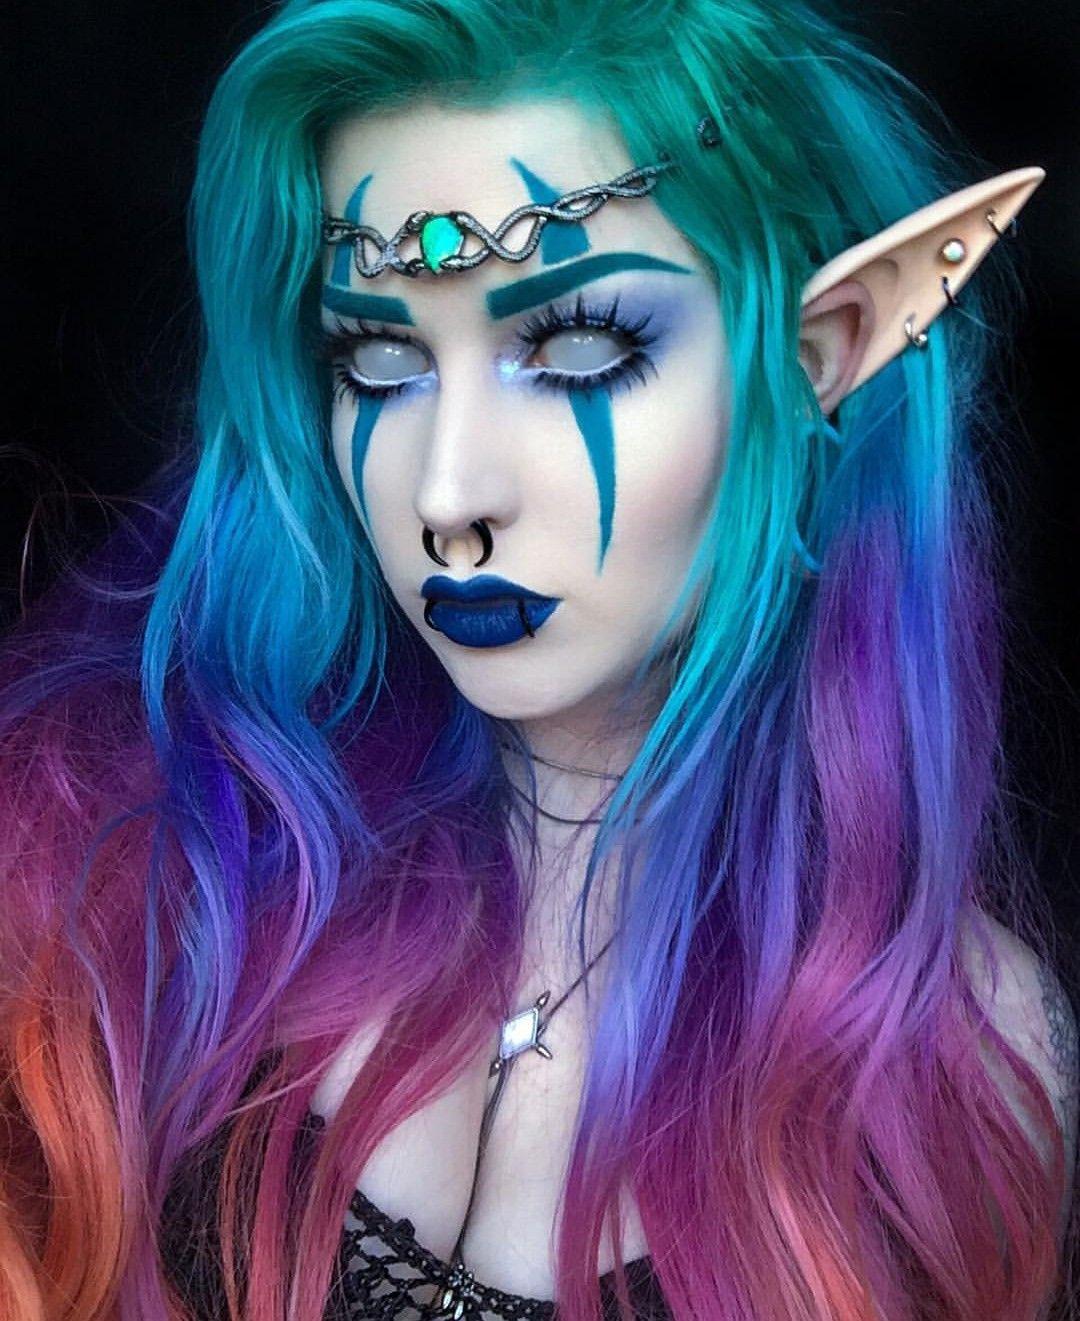 @riahboflavin | Halloween makeup, Cosplay makeup, Fantasy ...